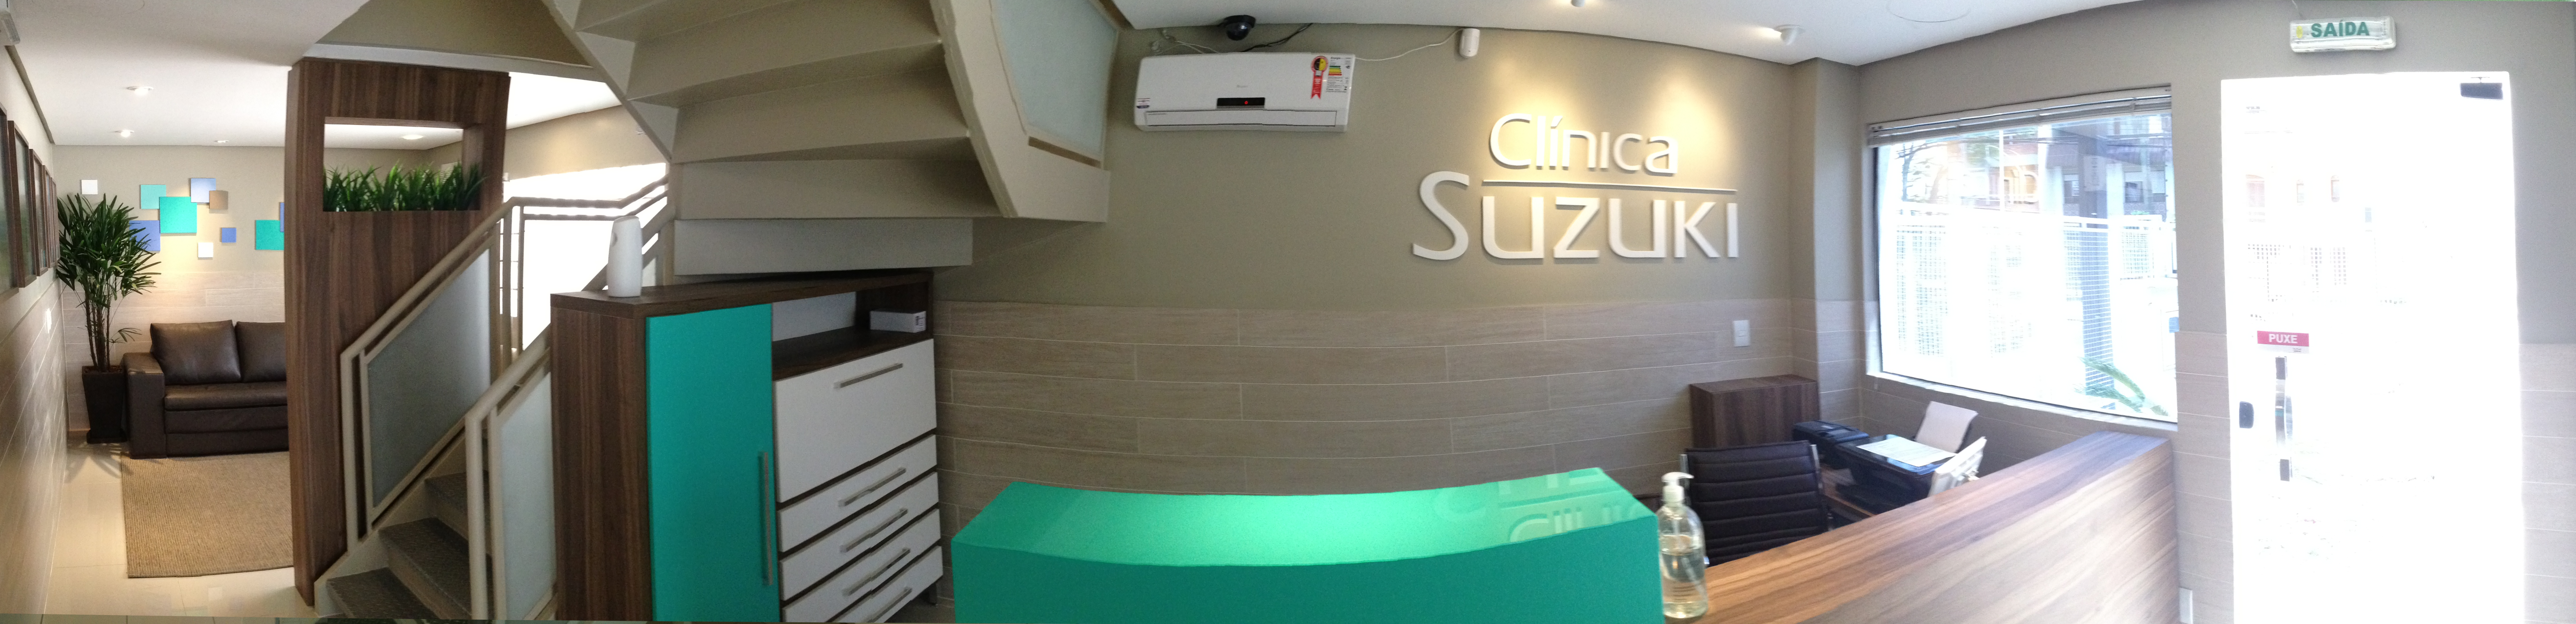 Clinica Suzuki